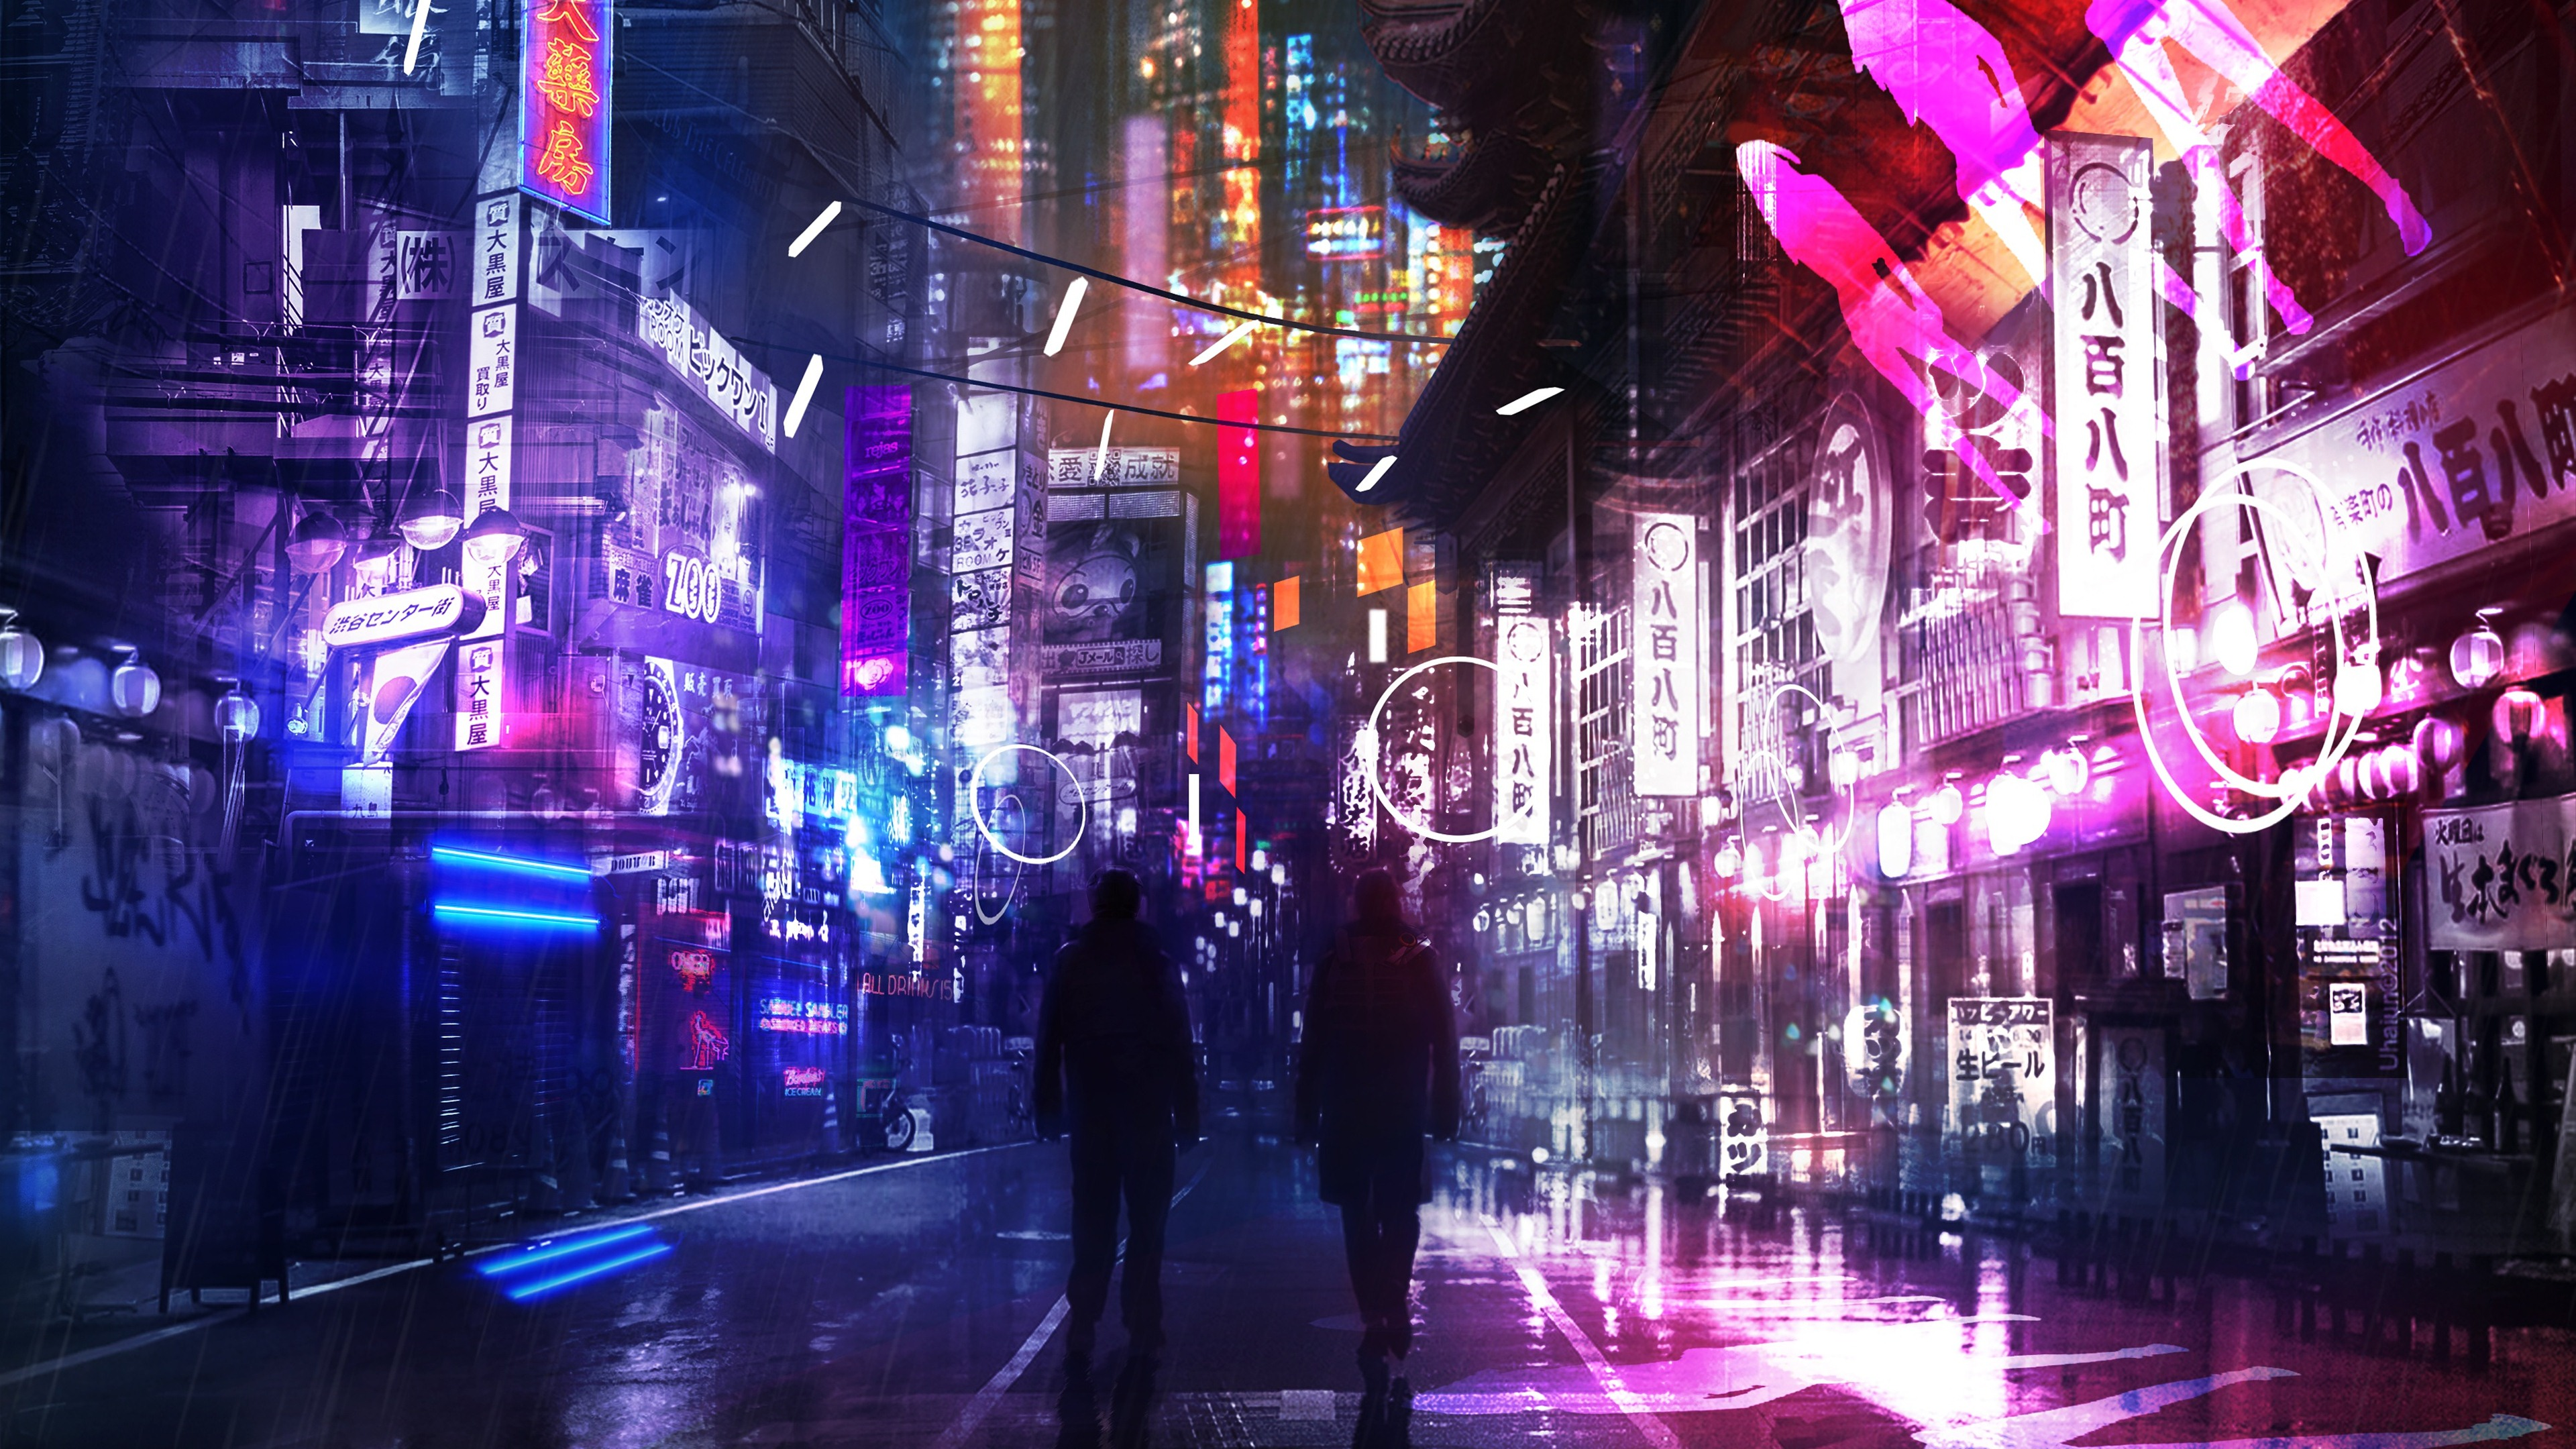 Anime Futuristic City Neon Wallpapers Wallpaper Cave